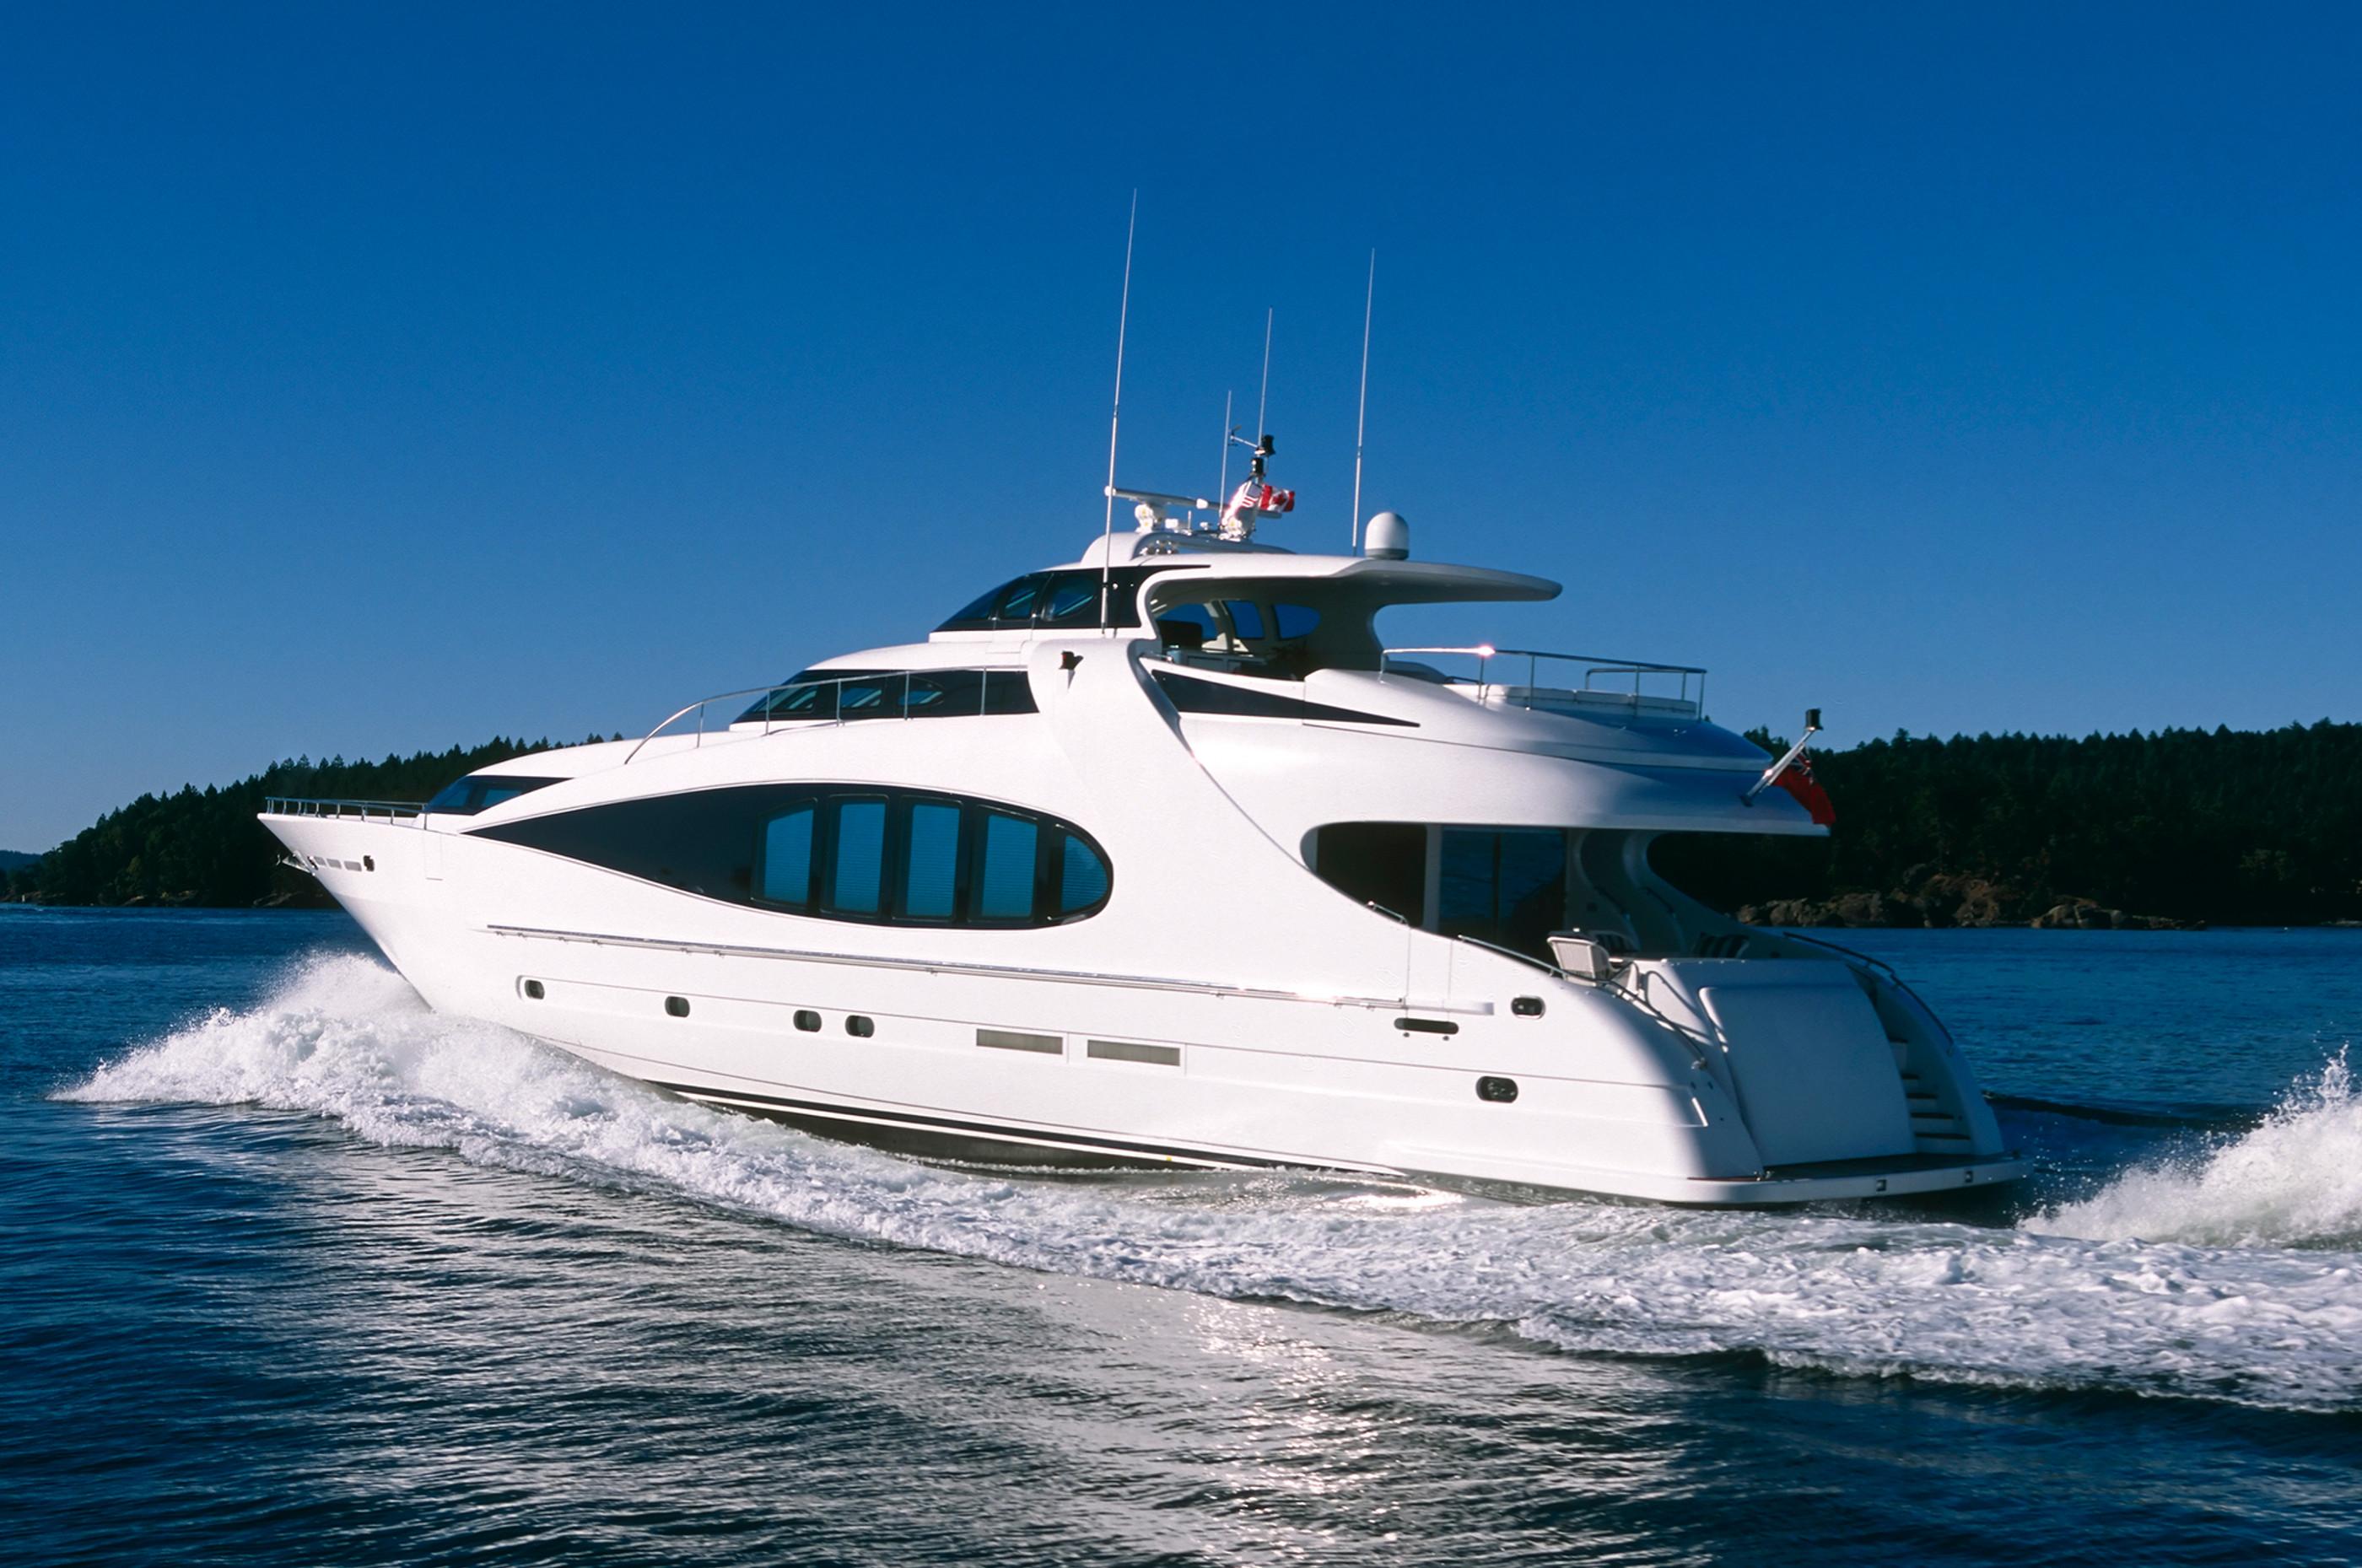 Deluxe Boat Detail